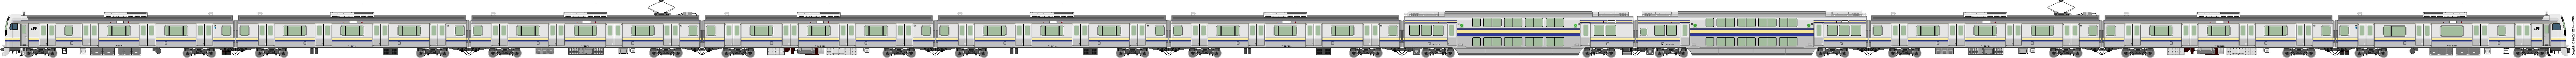 Train 5012